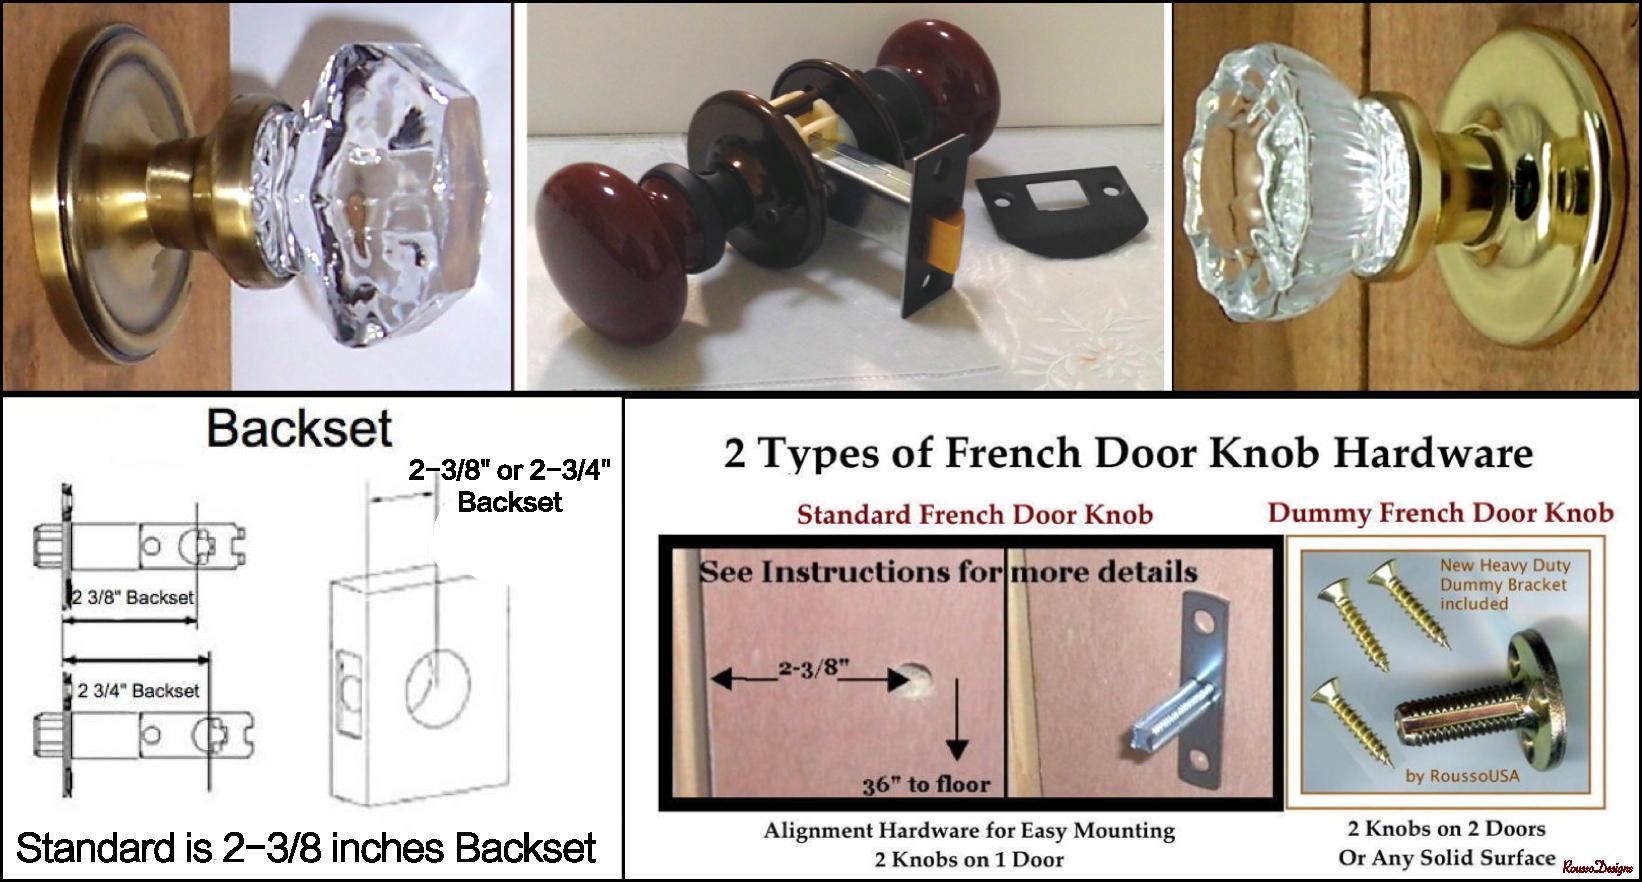 Crystal door knobs on french doors -  149 95